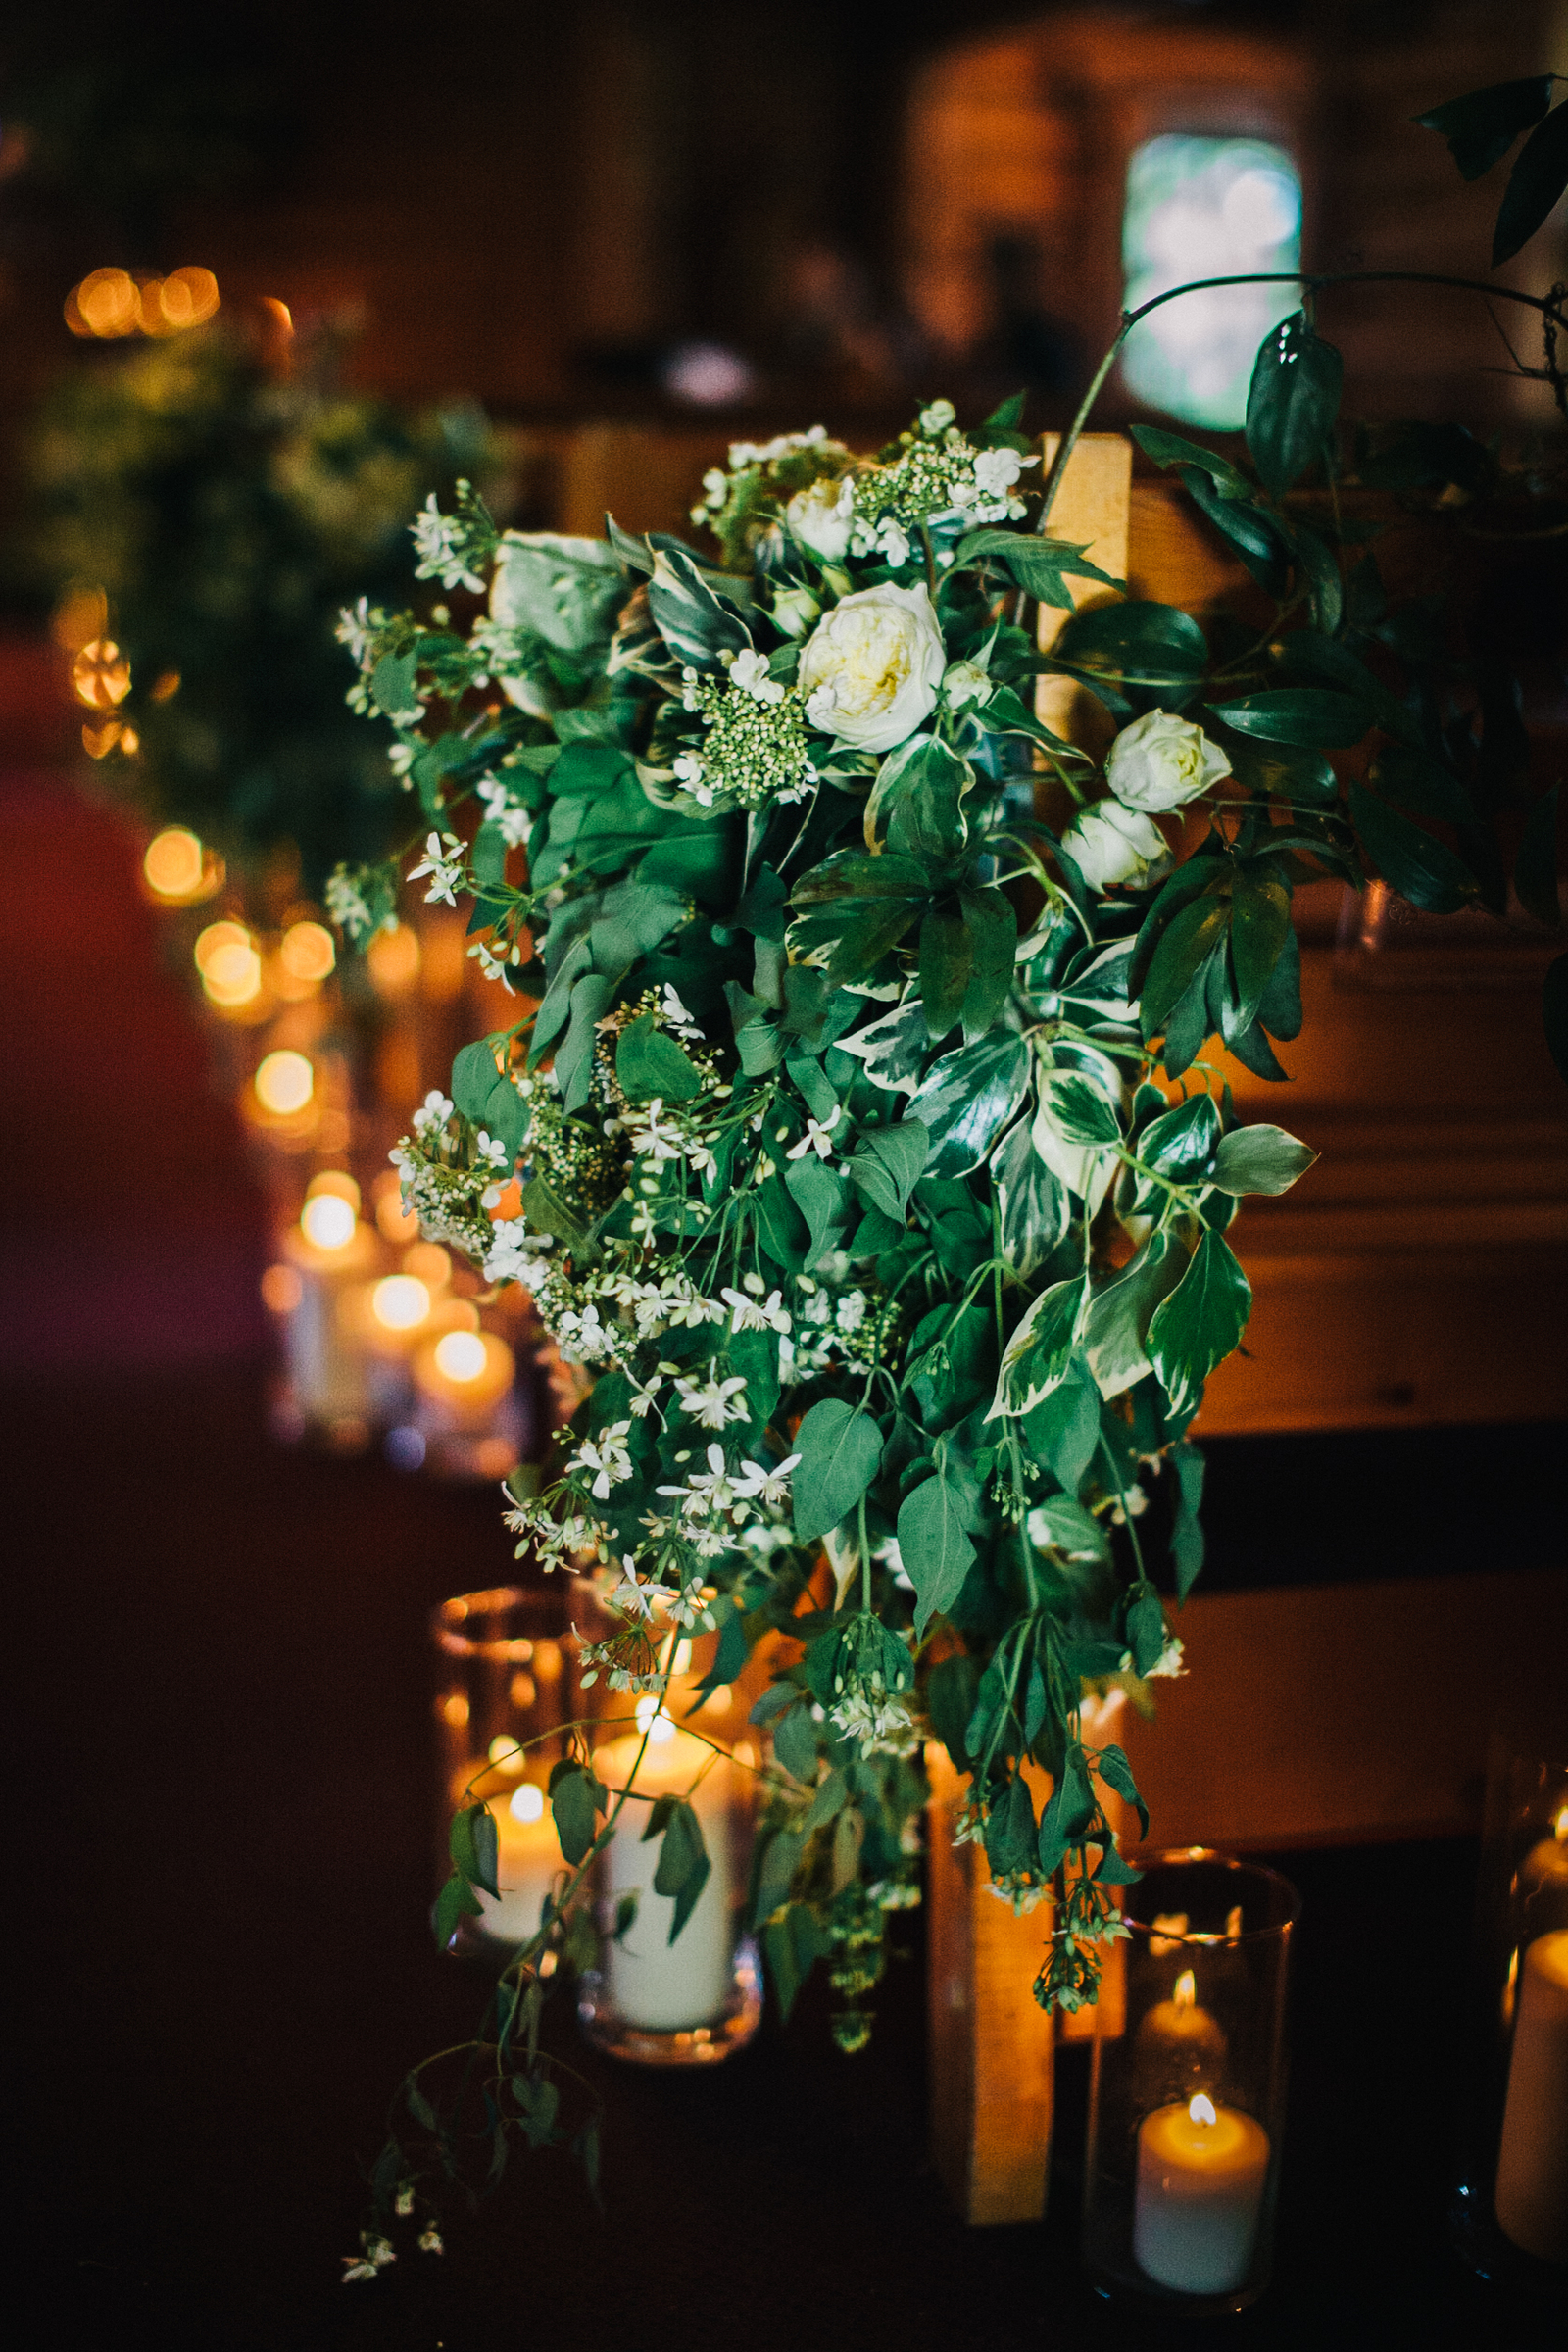 Cec_New_York_Lyndsey_Hamilton_Events_Wyoming_Amangani_Gold_Custom_Luxury_Wedding_Invitations_Stationery_Lifestlye_Inspiration_Personalized_Gold_Foil_Ivory_Jackson_Hole_Destination_Couture66.jpg